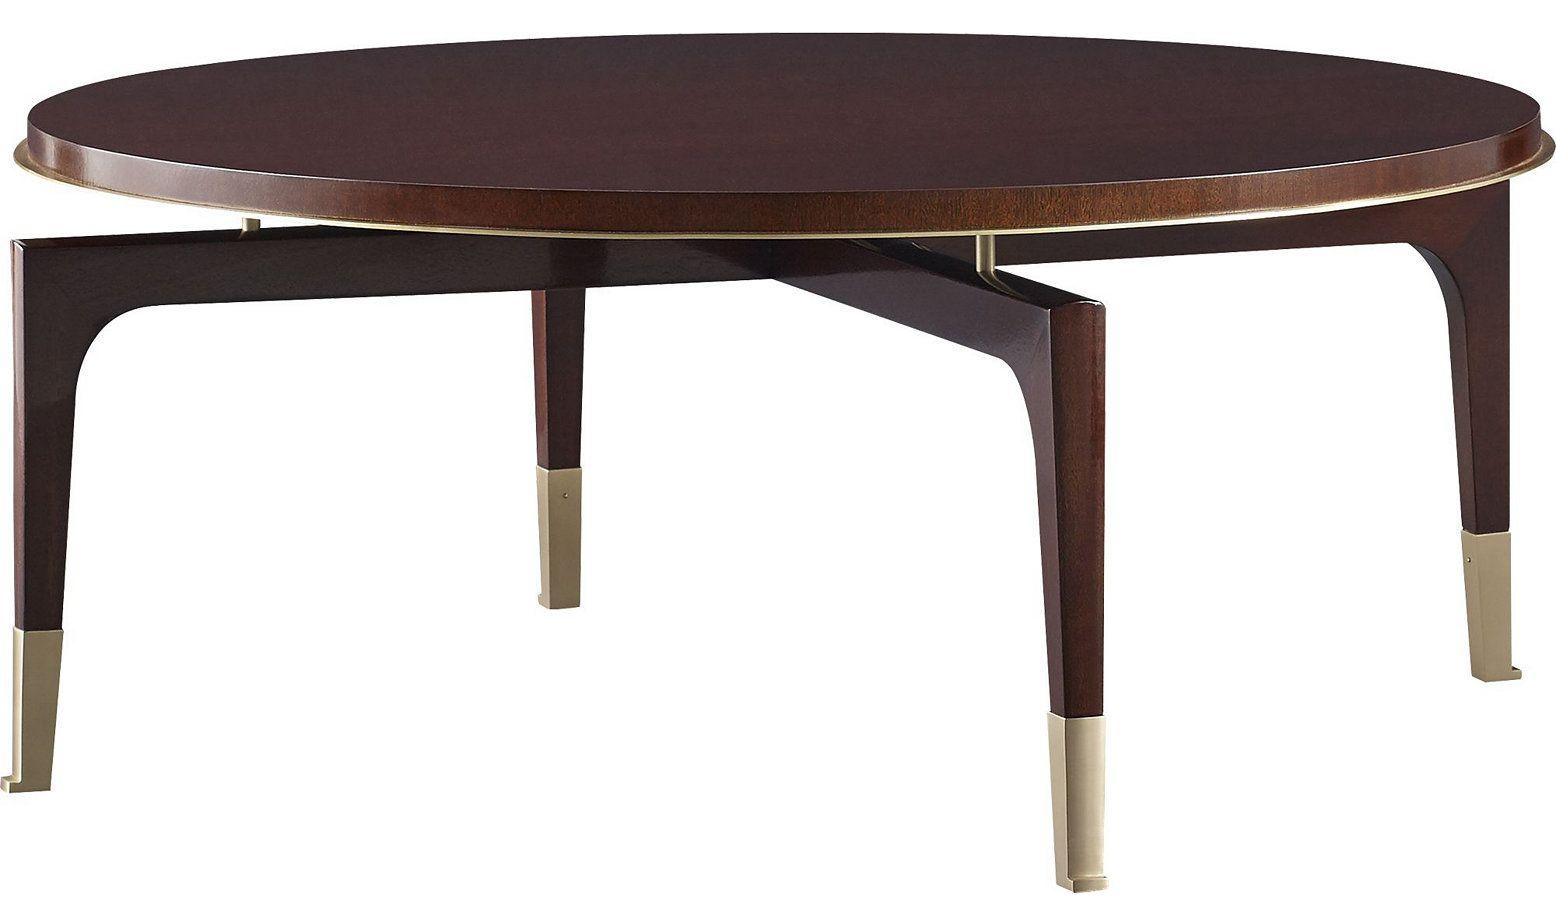 Vendome Cocktail Table By Thomas Pheasant 8739 Baker Furniture Coffee Table Inspiration Thomas Pheasant Table [ 924 x 1556 Pixel ]